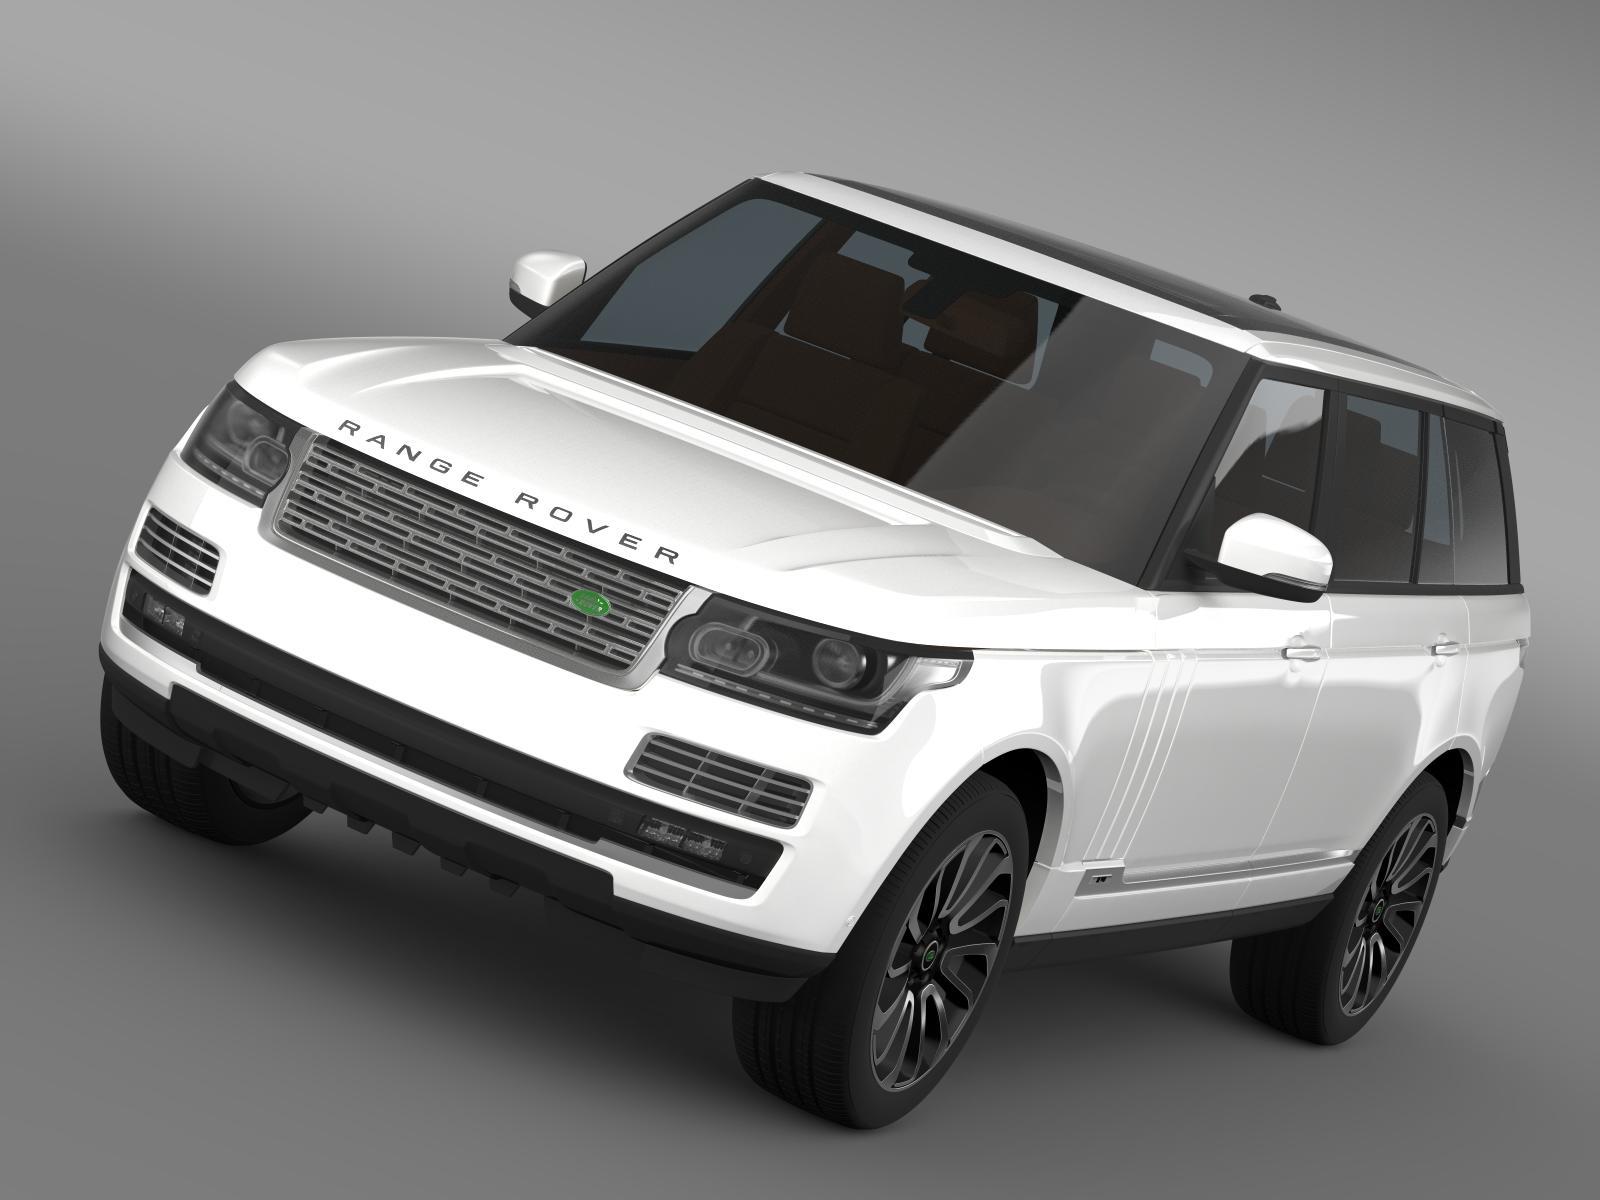 range rover autobiography lwb l405 2014 3d model 3ds max fbx c4d lwo ma mb hrc xsi obj 203301